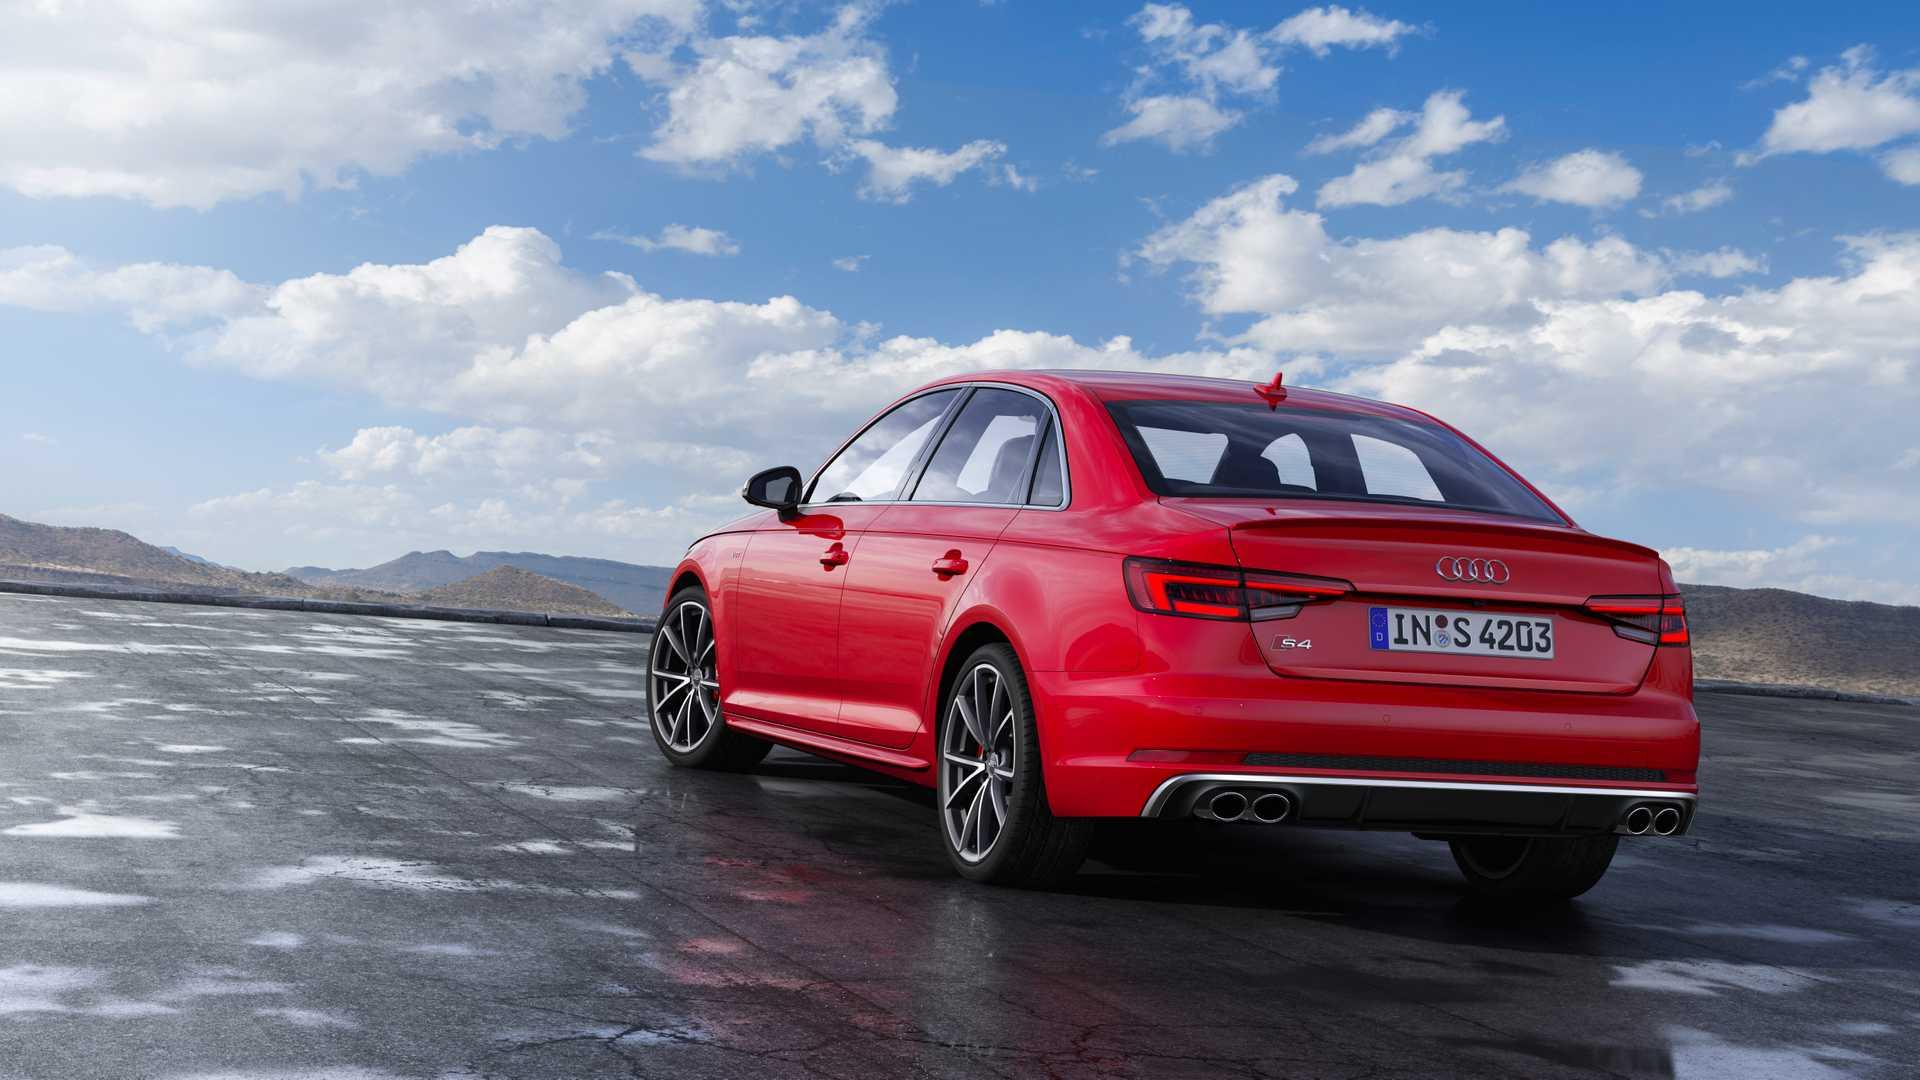 2019 Audi S4 Sedan TDI (Color: Misano Red) Rear Three-Quarter Wallpapers #32 of 39